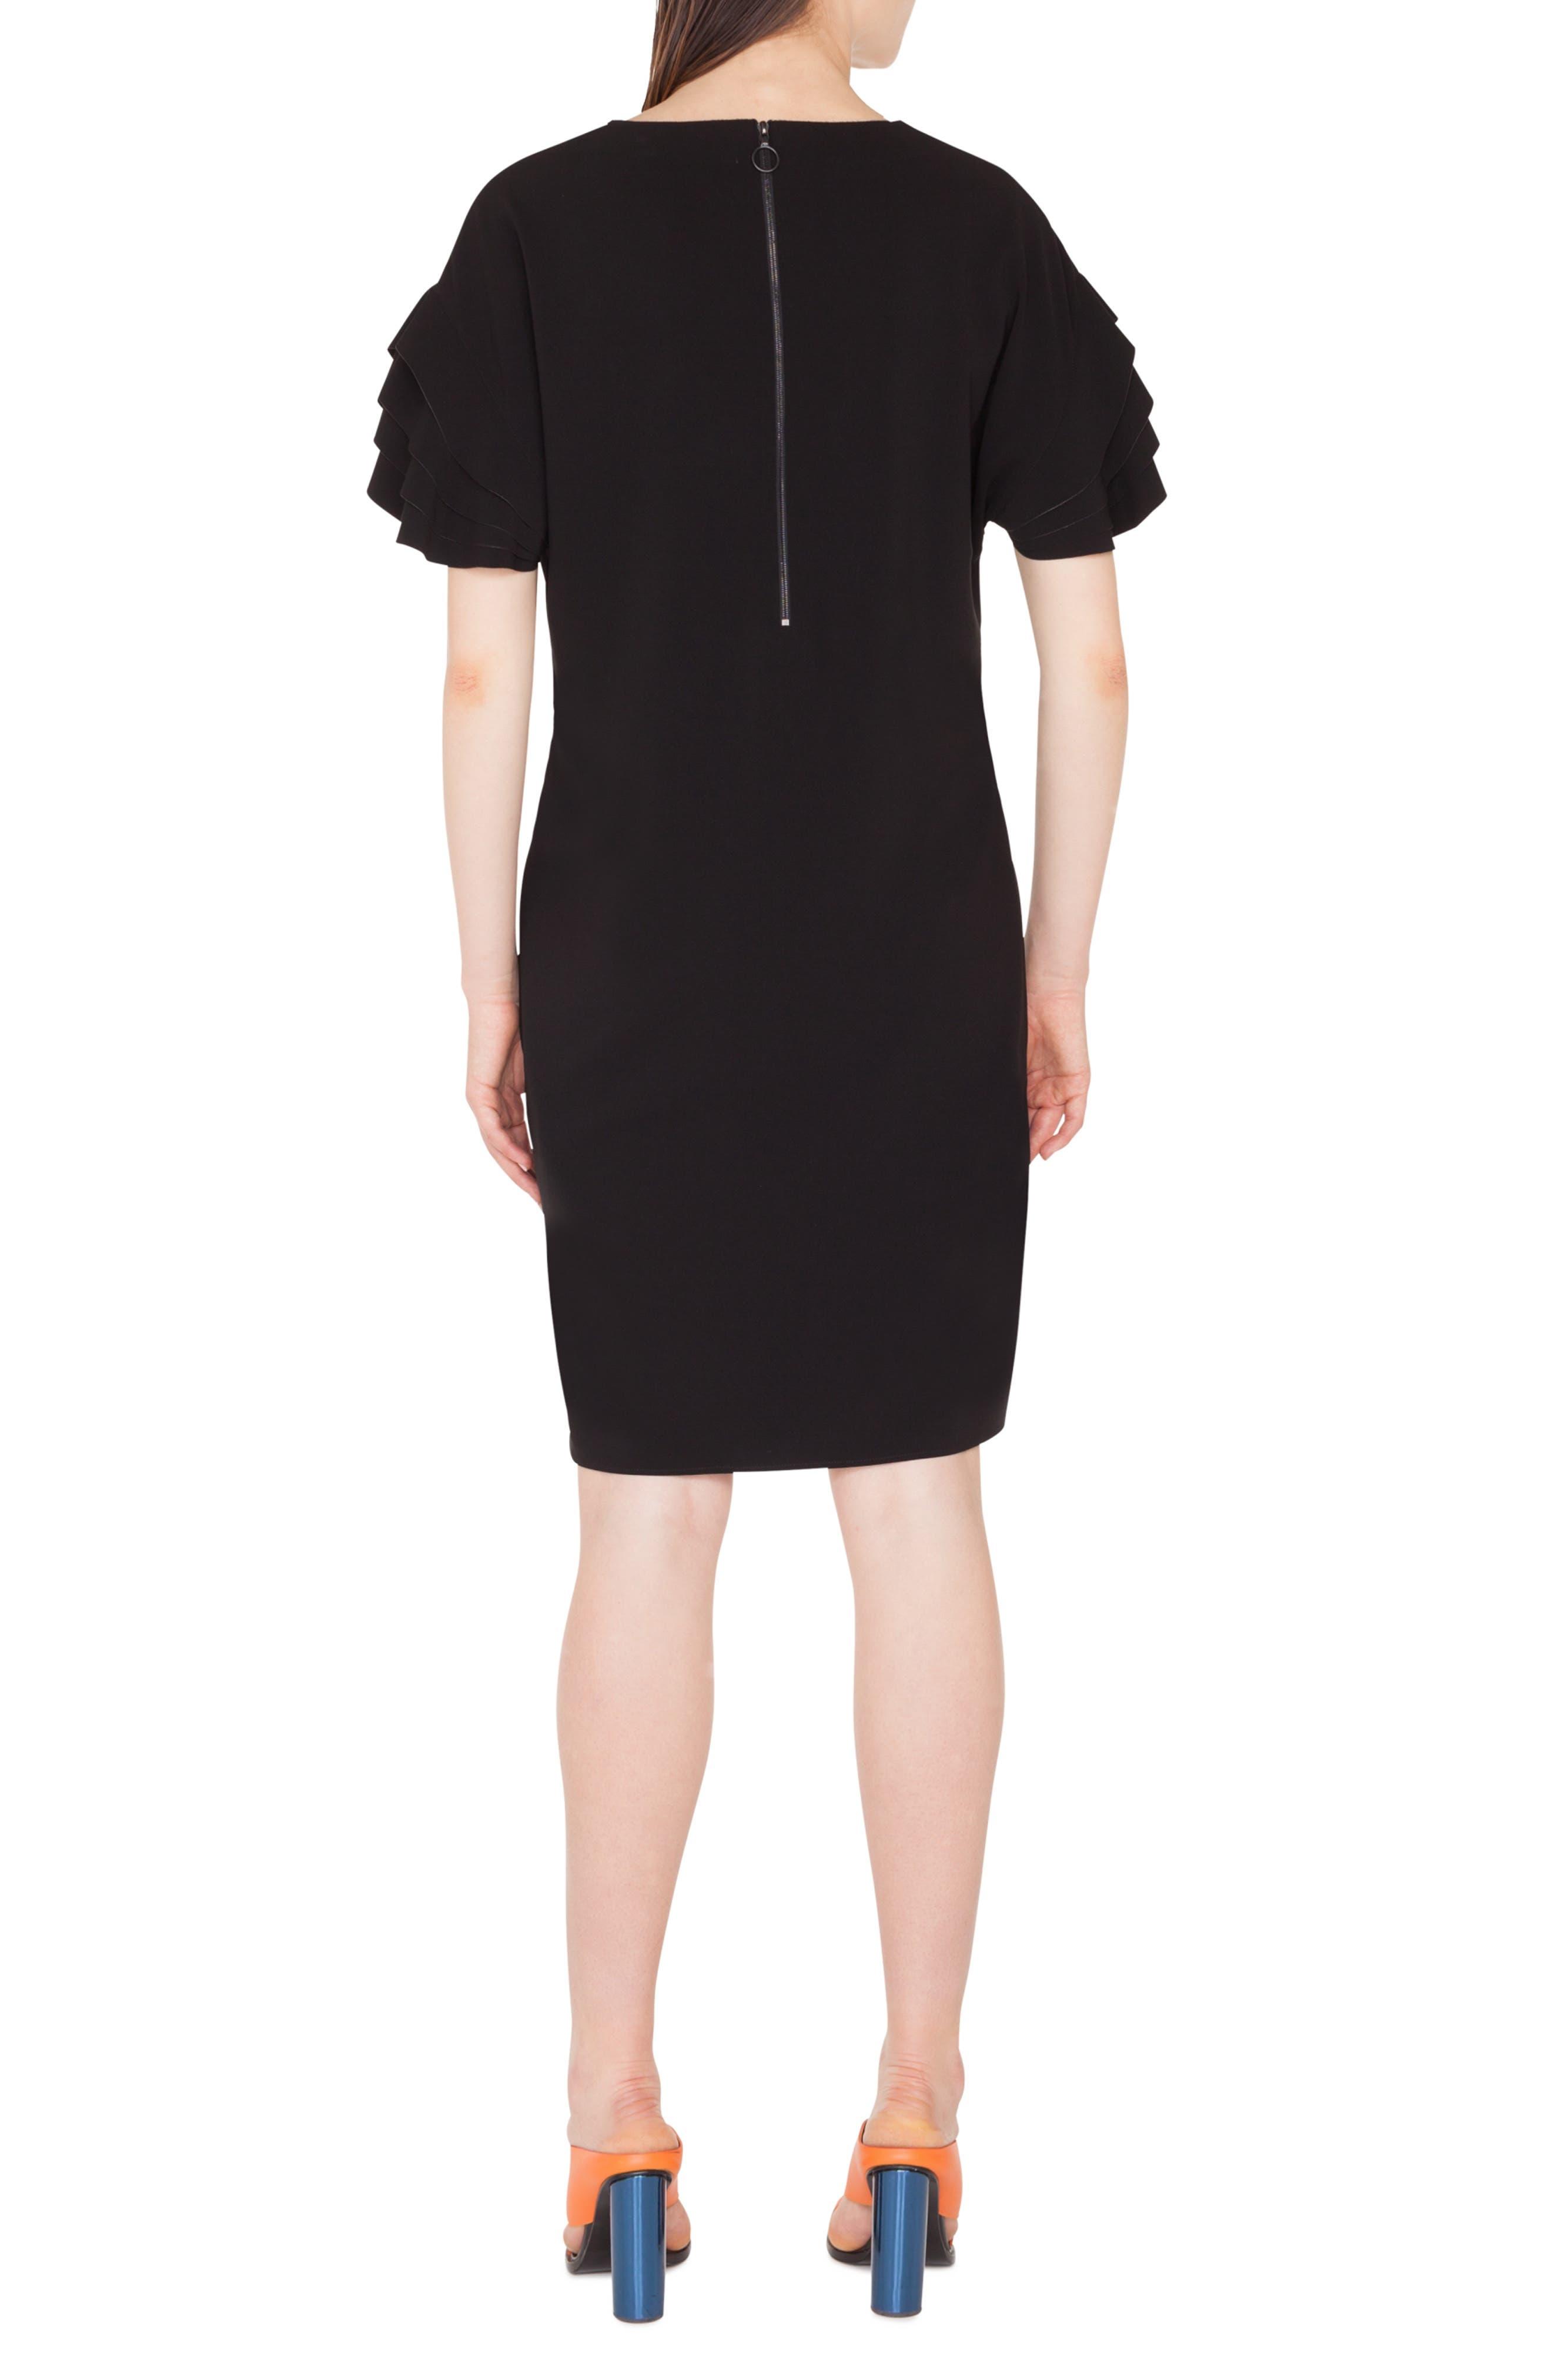 AKRIS PUNTO,                             Layered Sleeve Dress,                             Alternate thumbnail 2, color,                             NERO